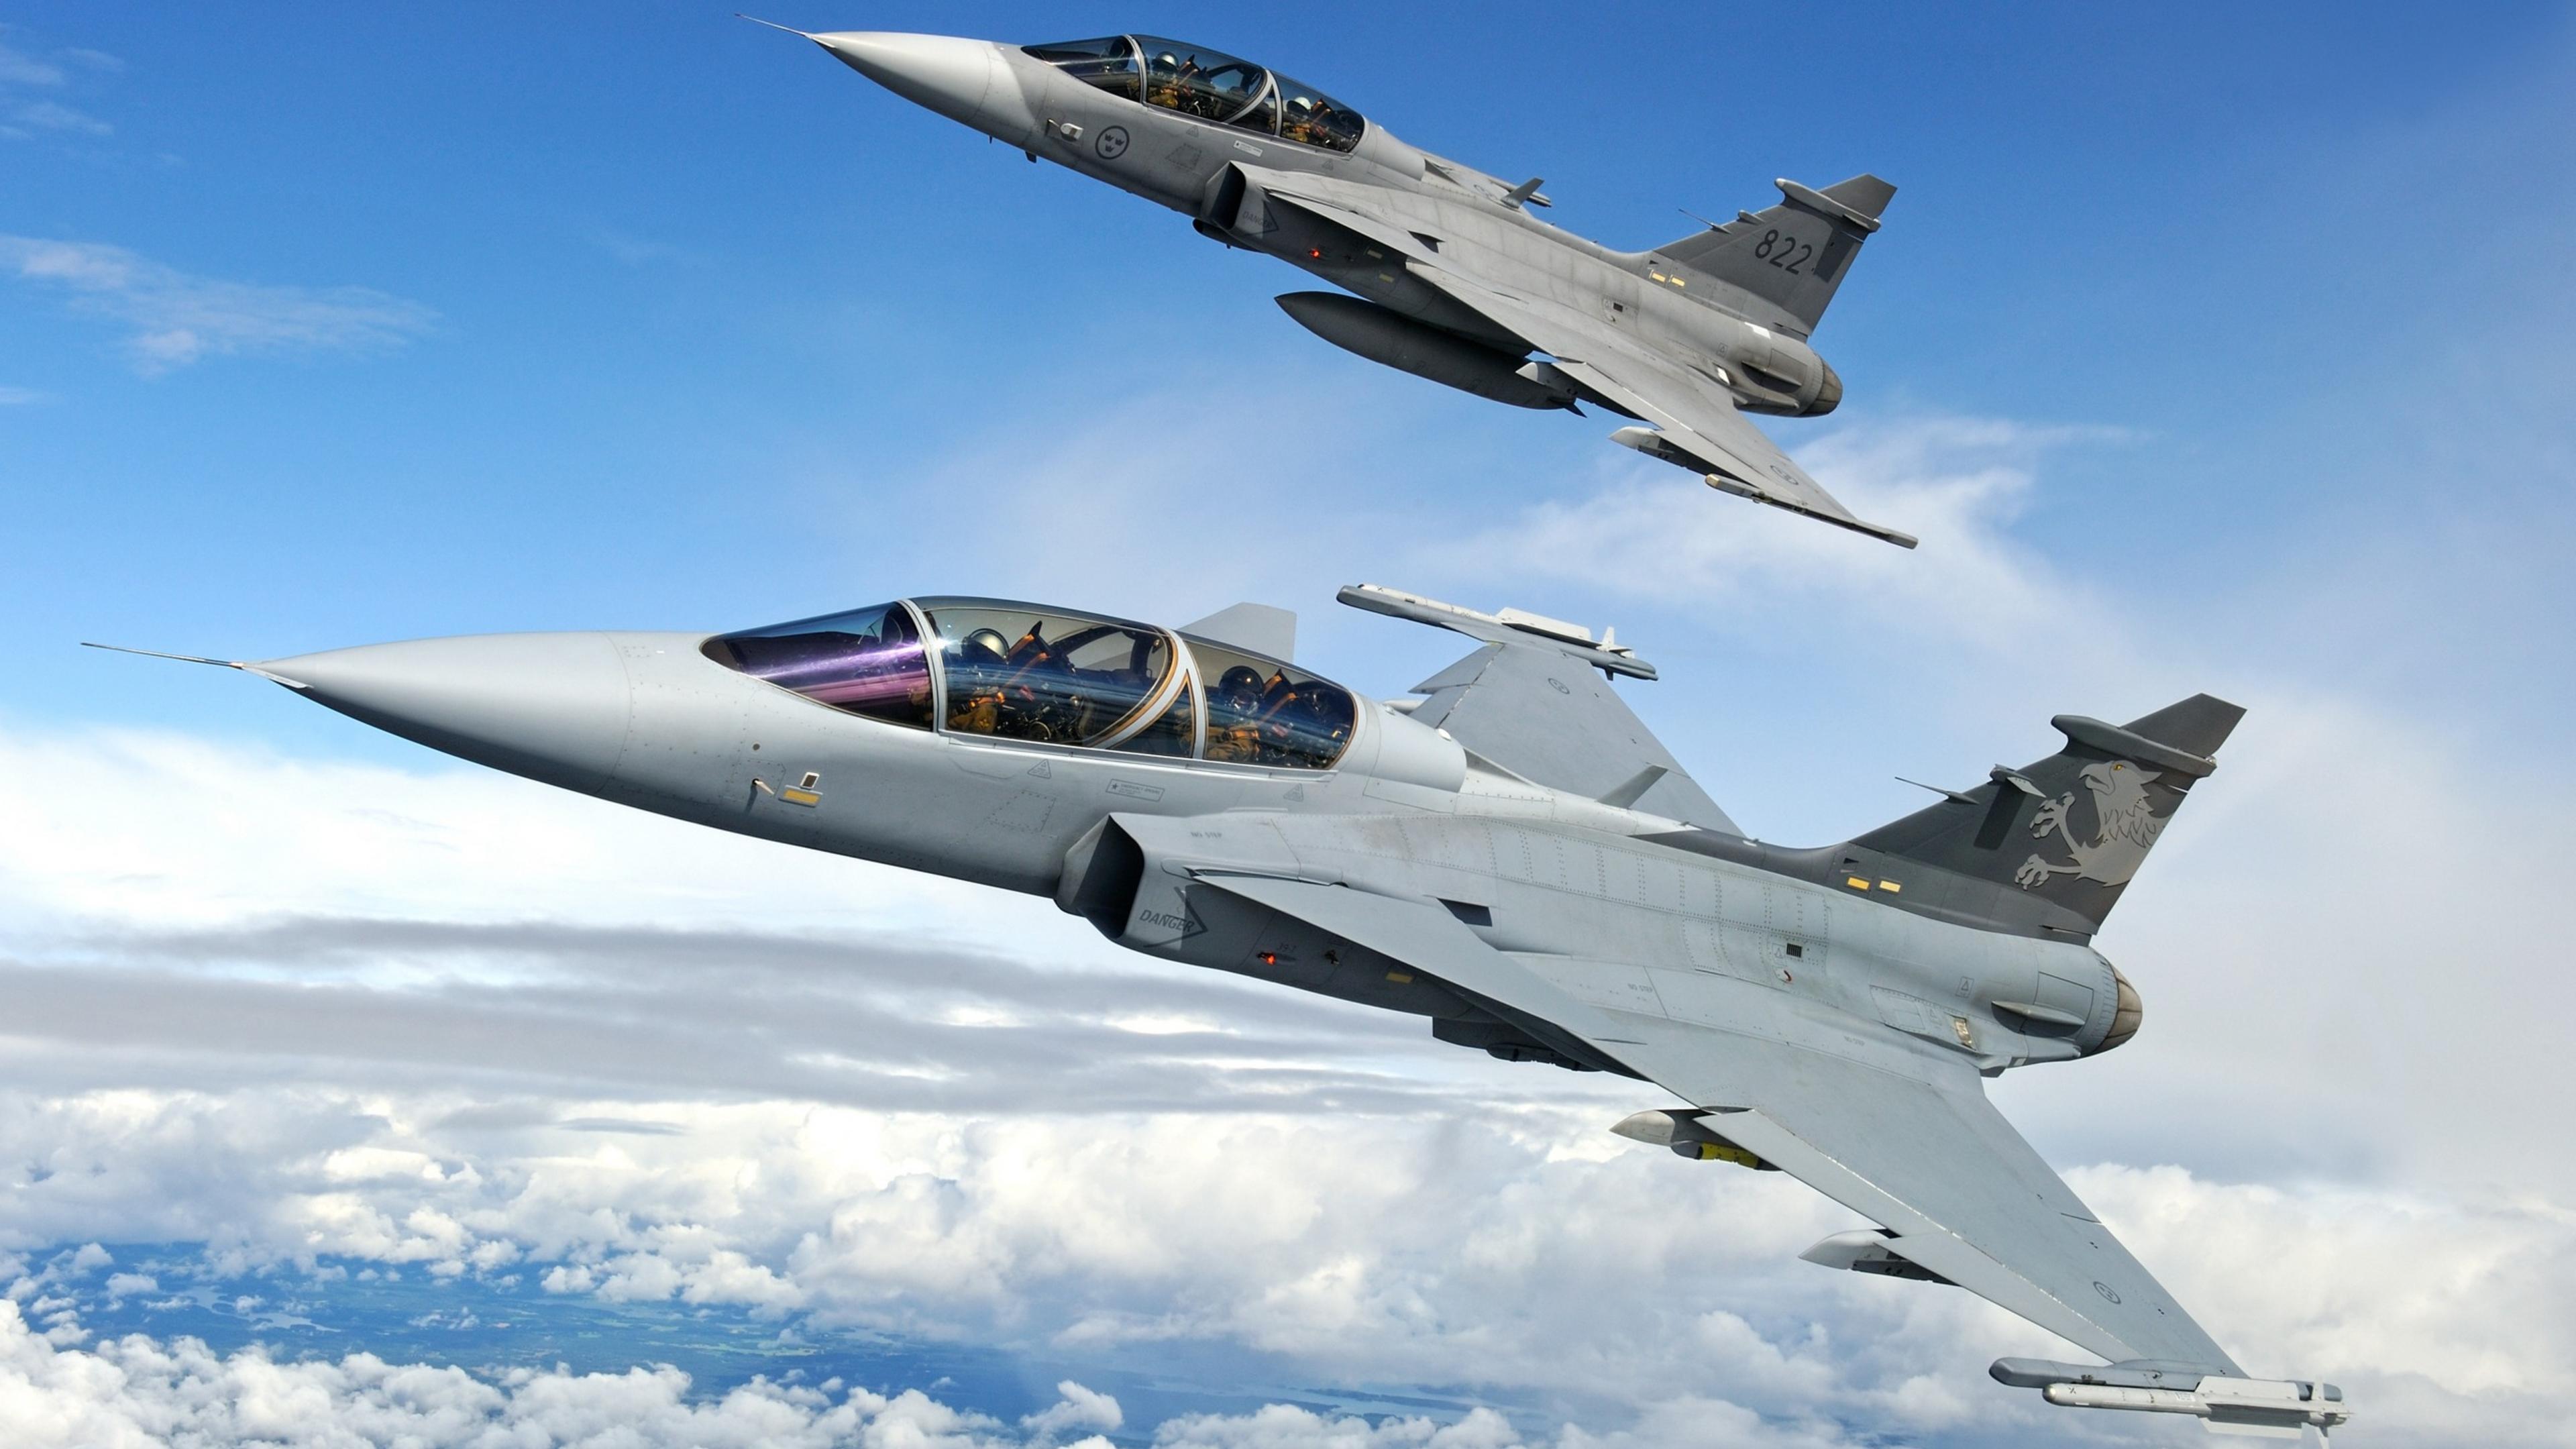 Обои Самолёт, красота, самолеты. Авиация foto 16